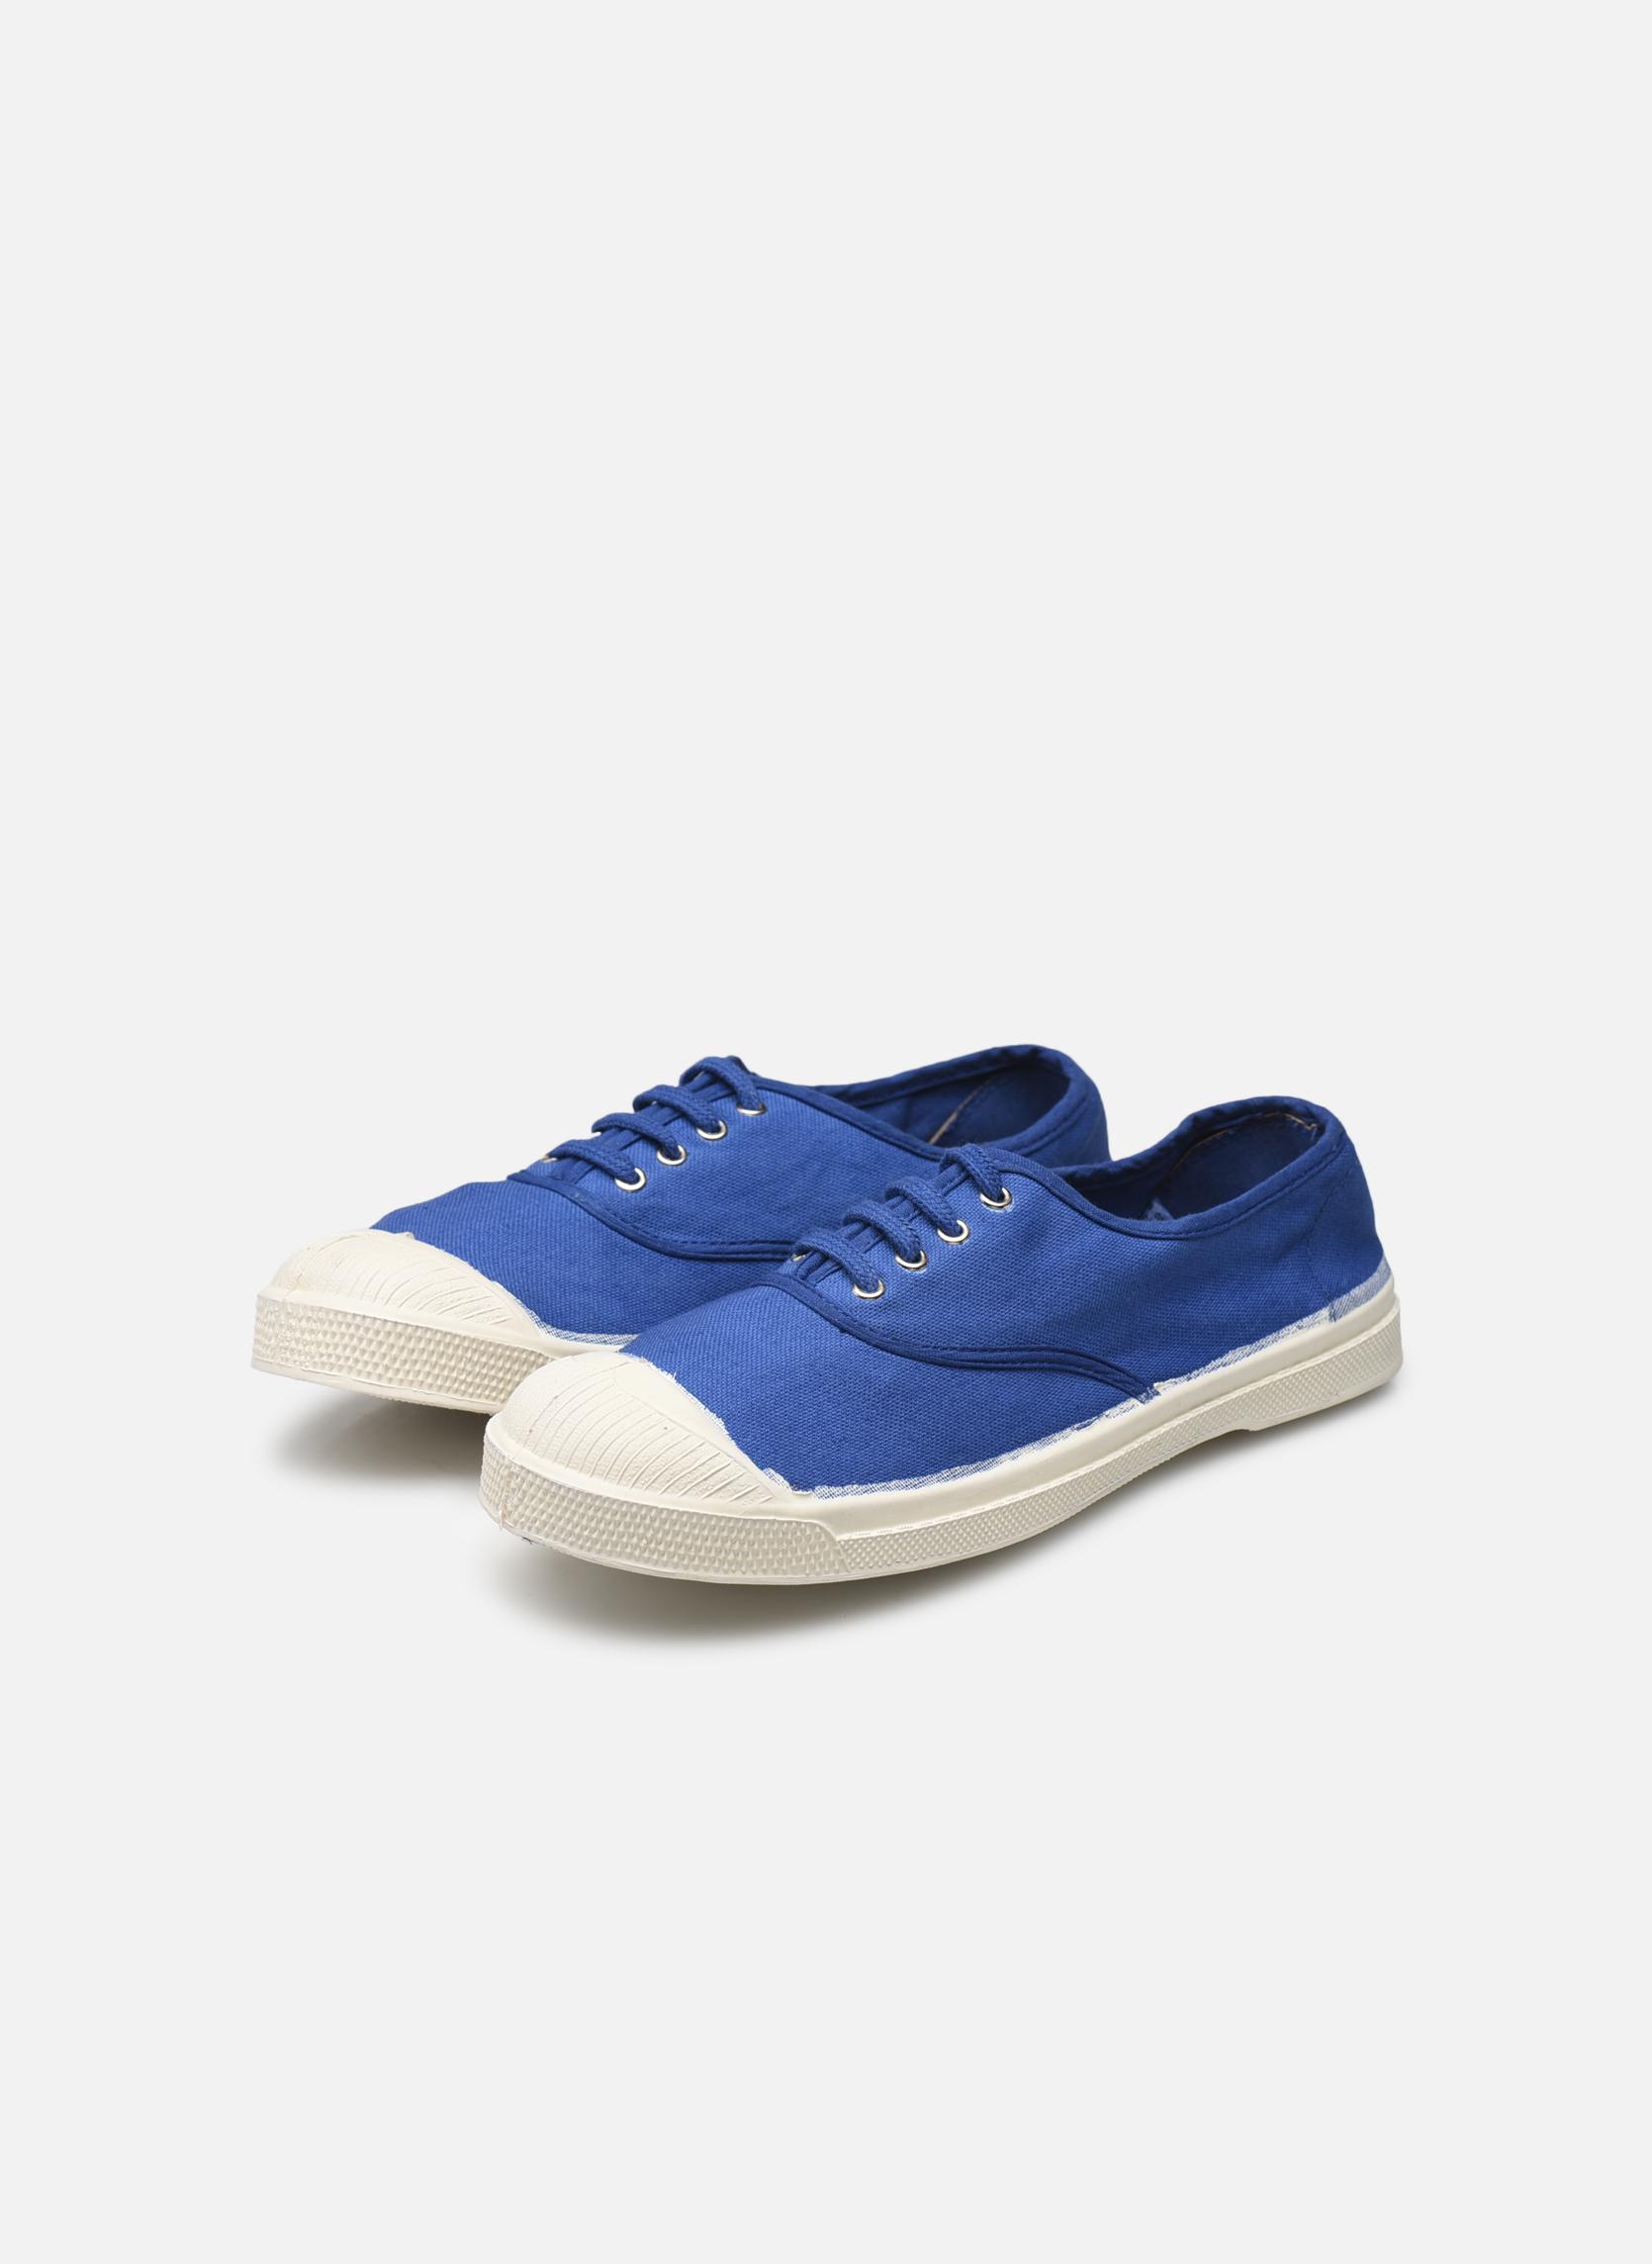 Tennis Lacets Bleu Vif